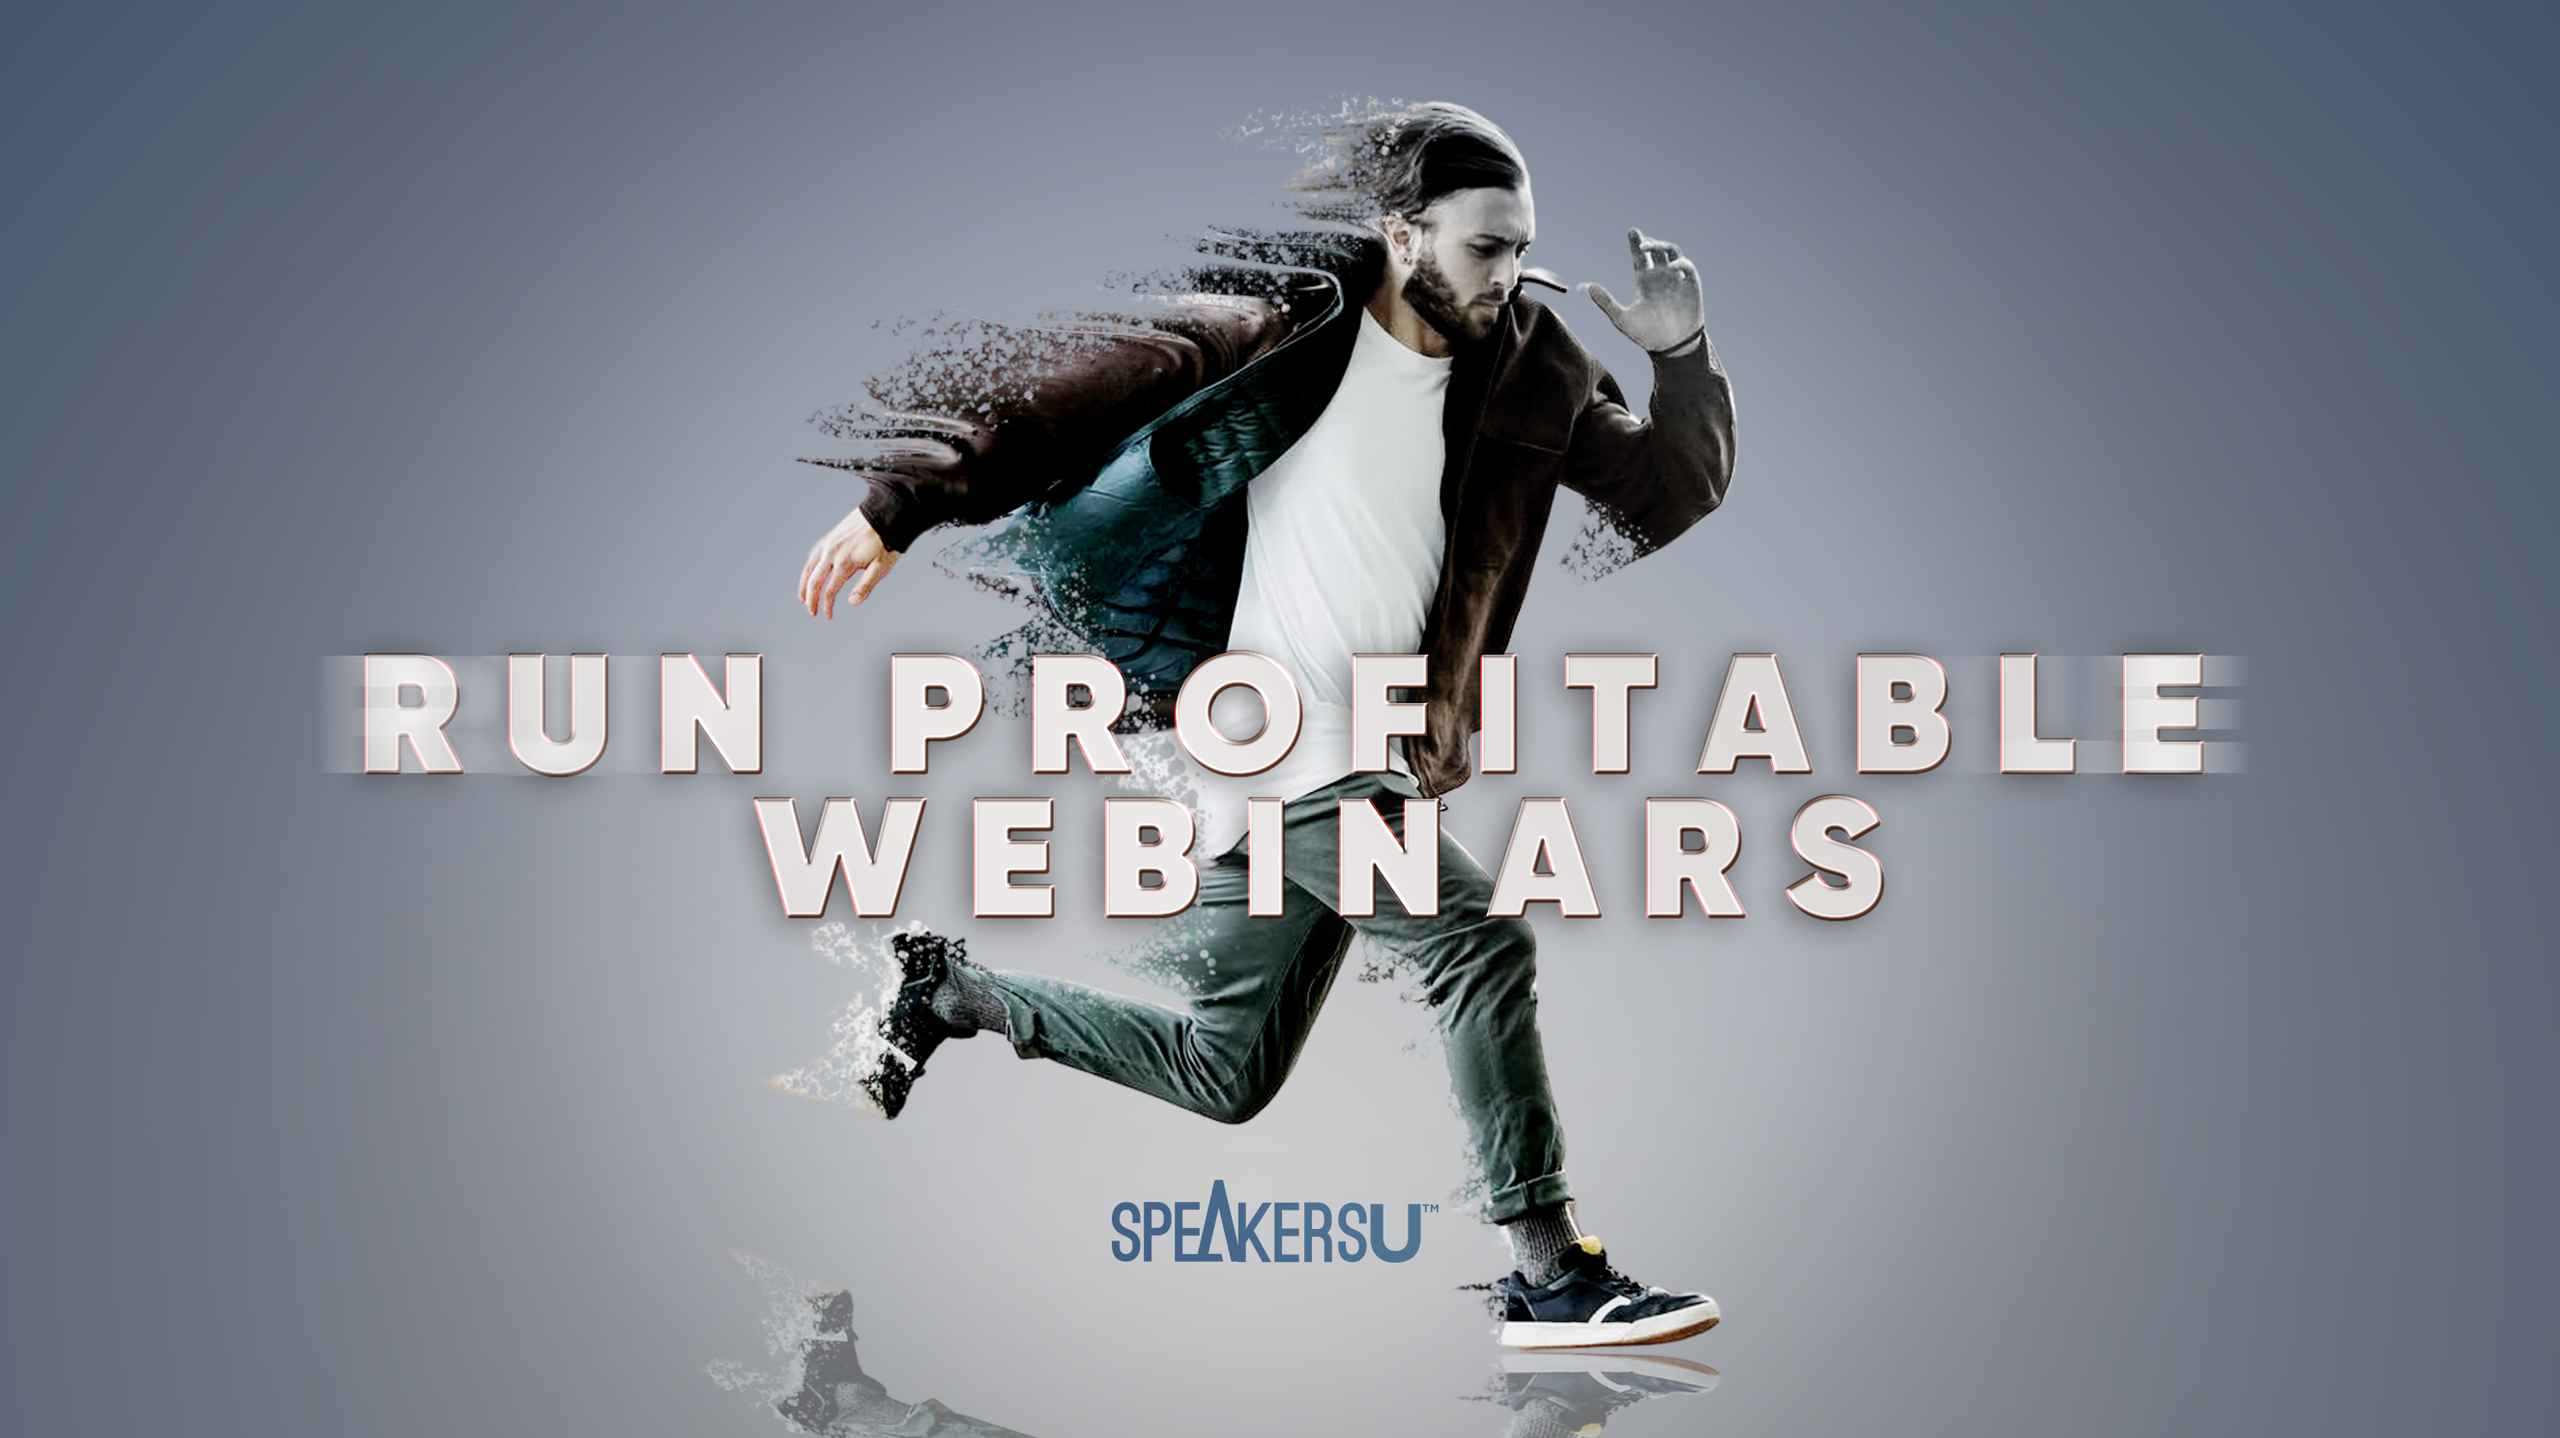 How To Run Profitable Webinars